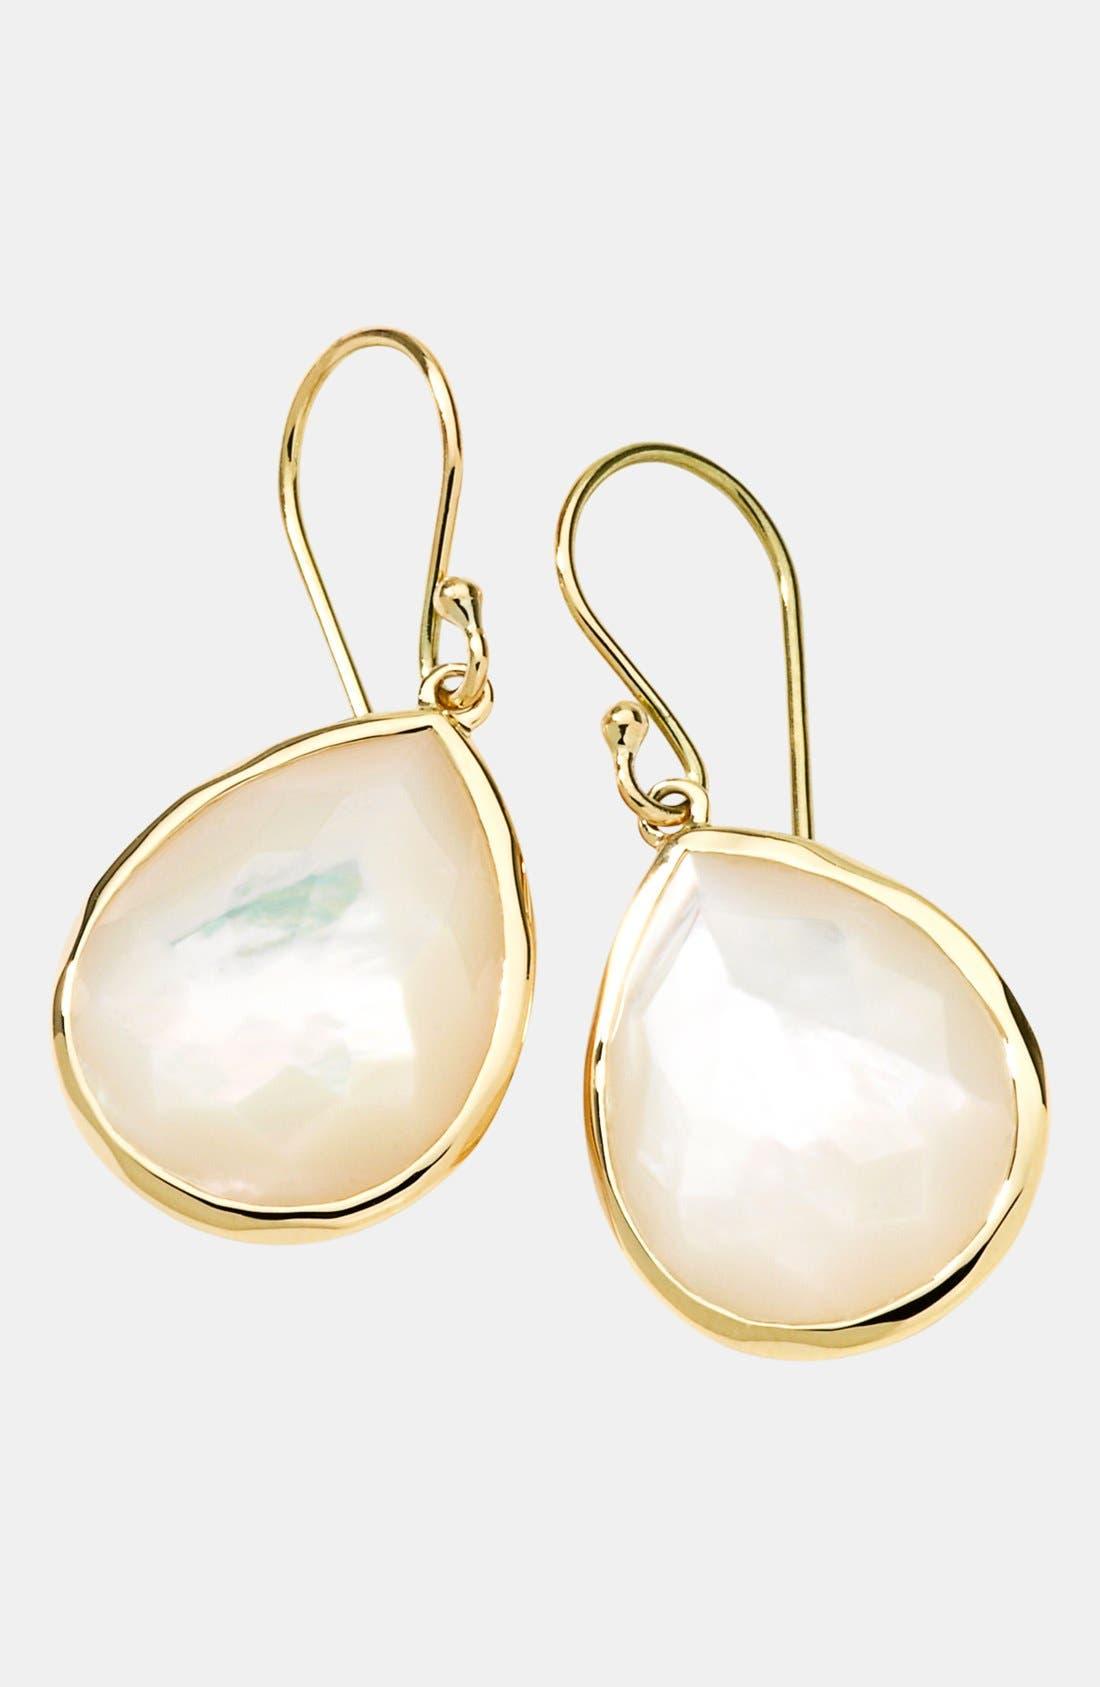 Alternate Image 1 Selected - Ippolita 'Rock Candy' 18k Gold Teardrop Earrings